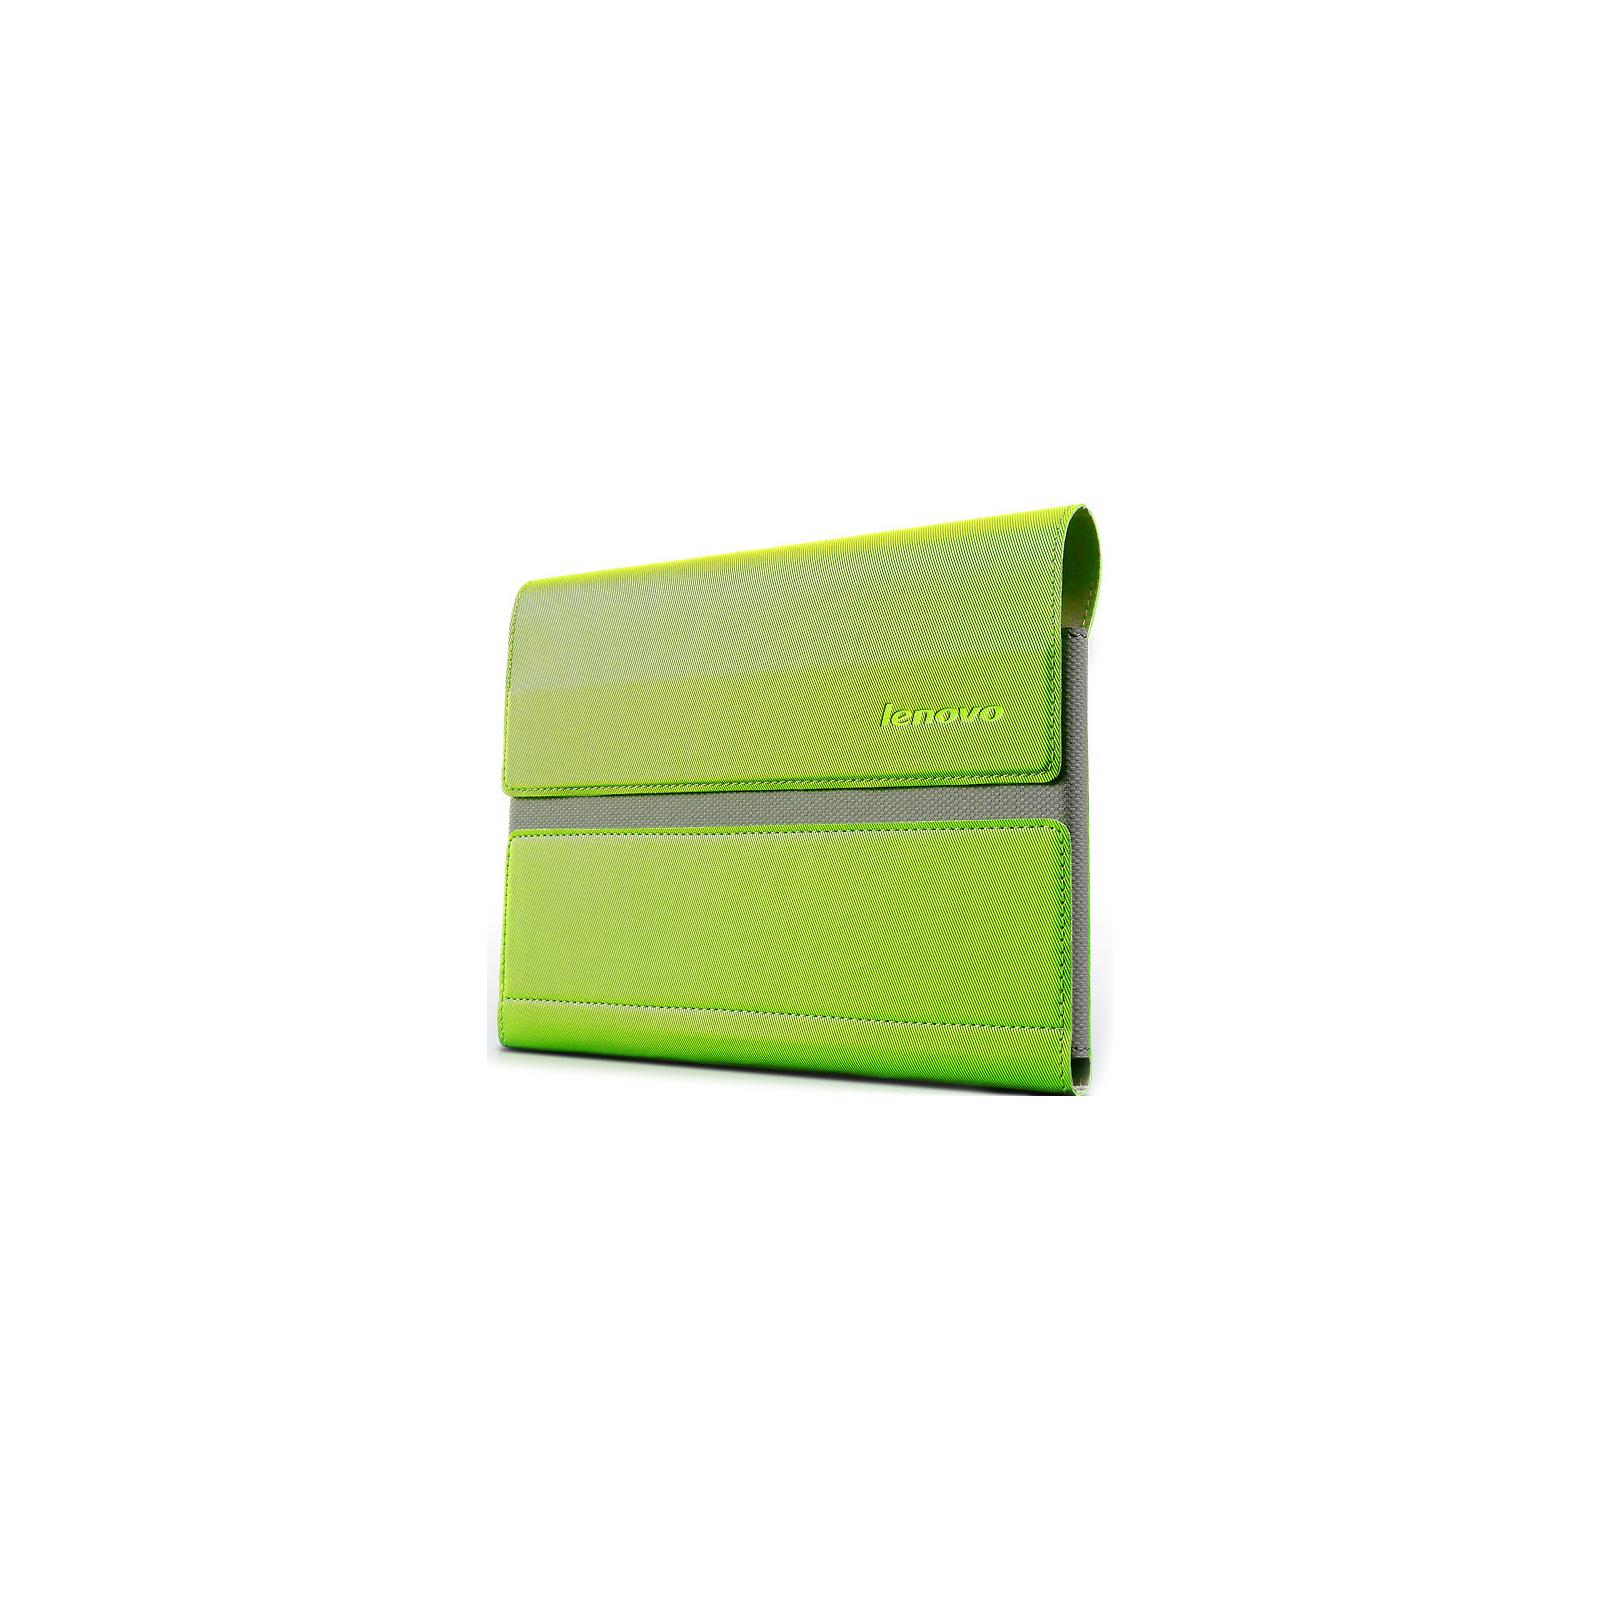 Чехол для планшета Lenovo 10' B8000 Yoga Tablet, Sleeve and Film Green (888016011)